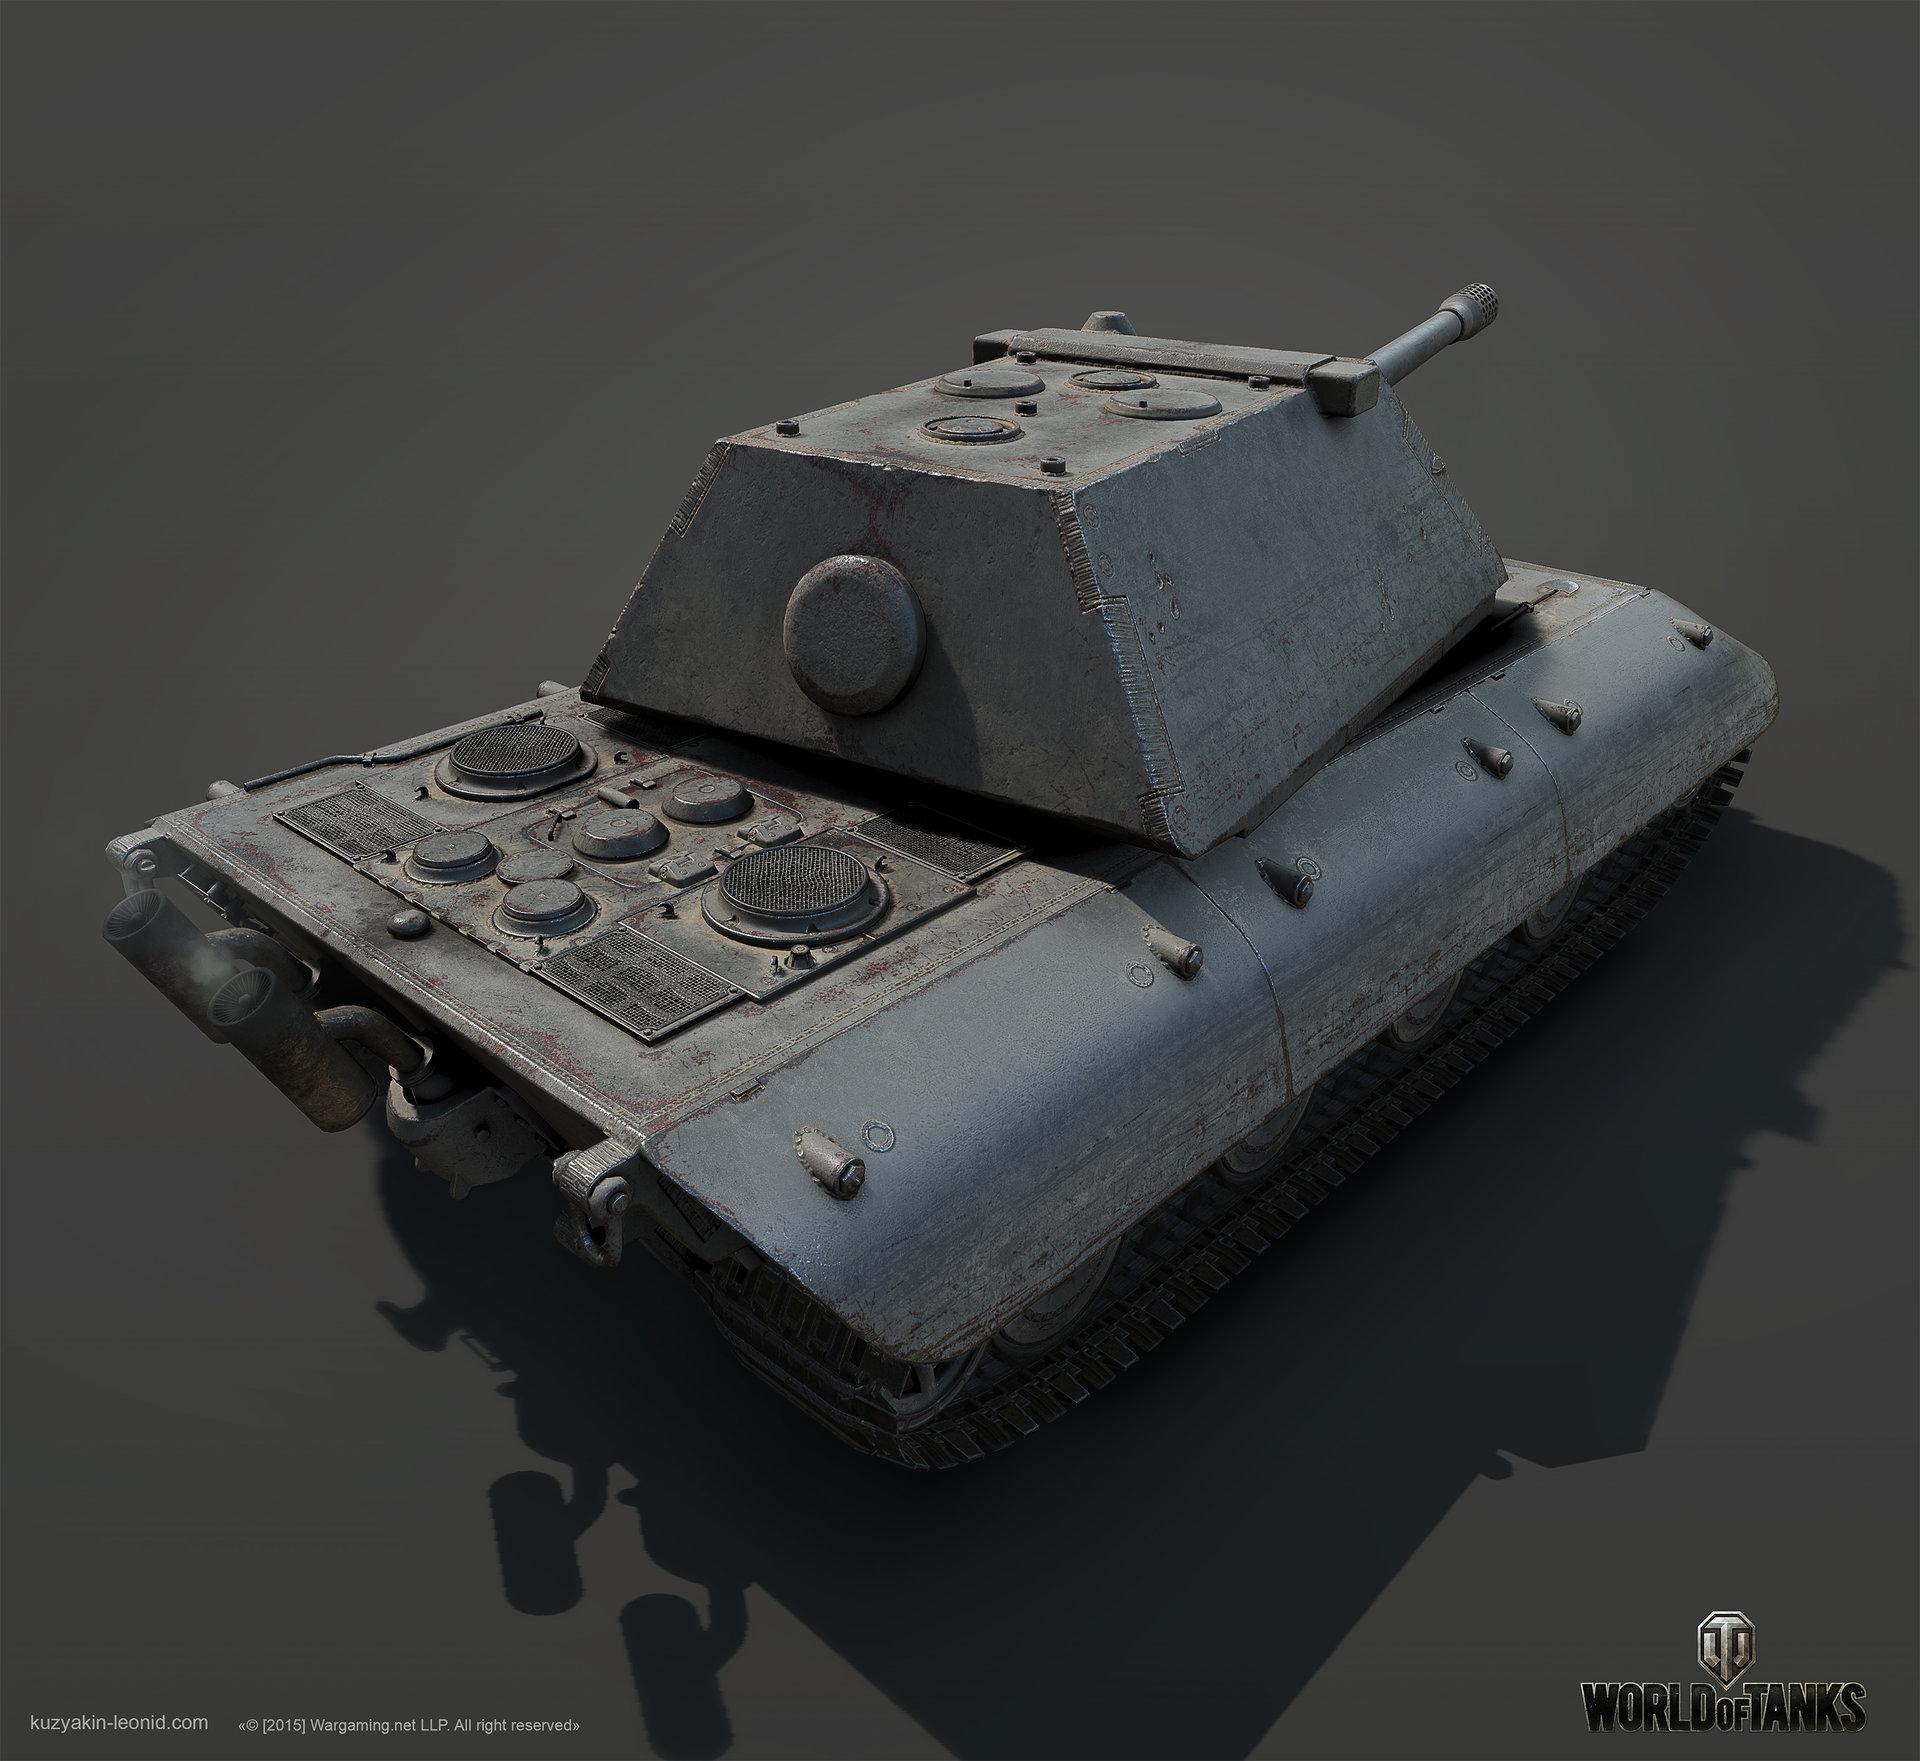 Leonid kuzyakin e 100 02